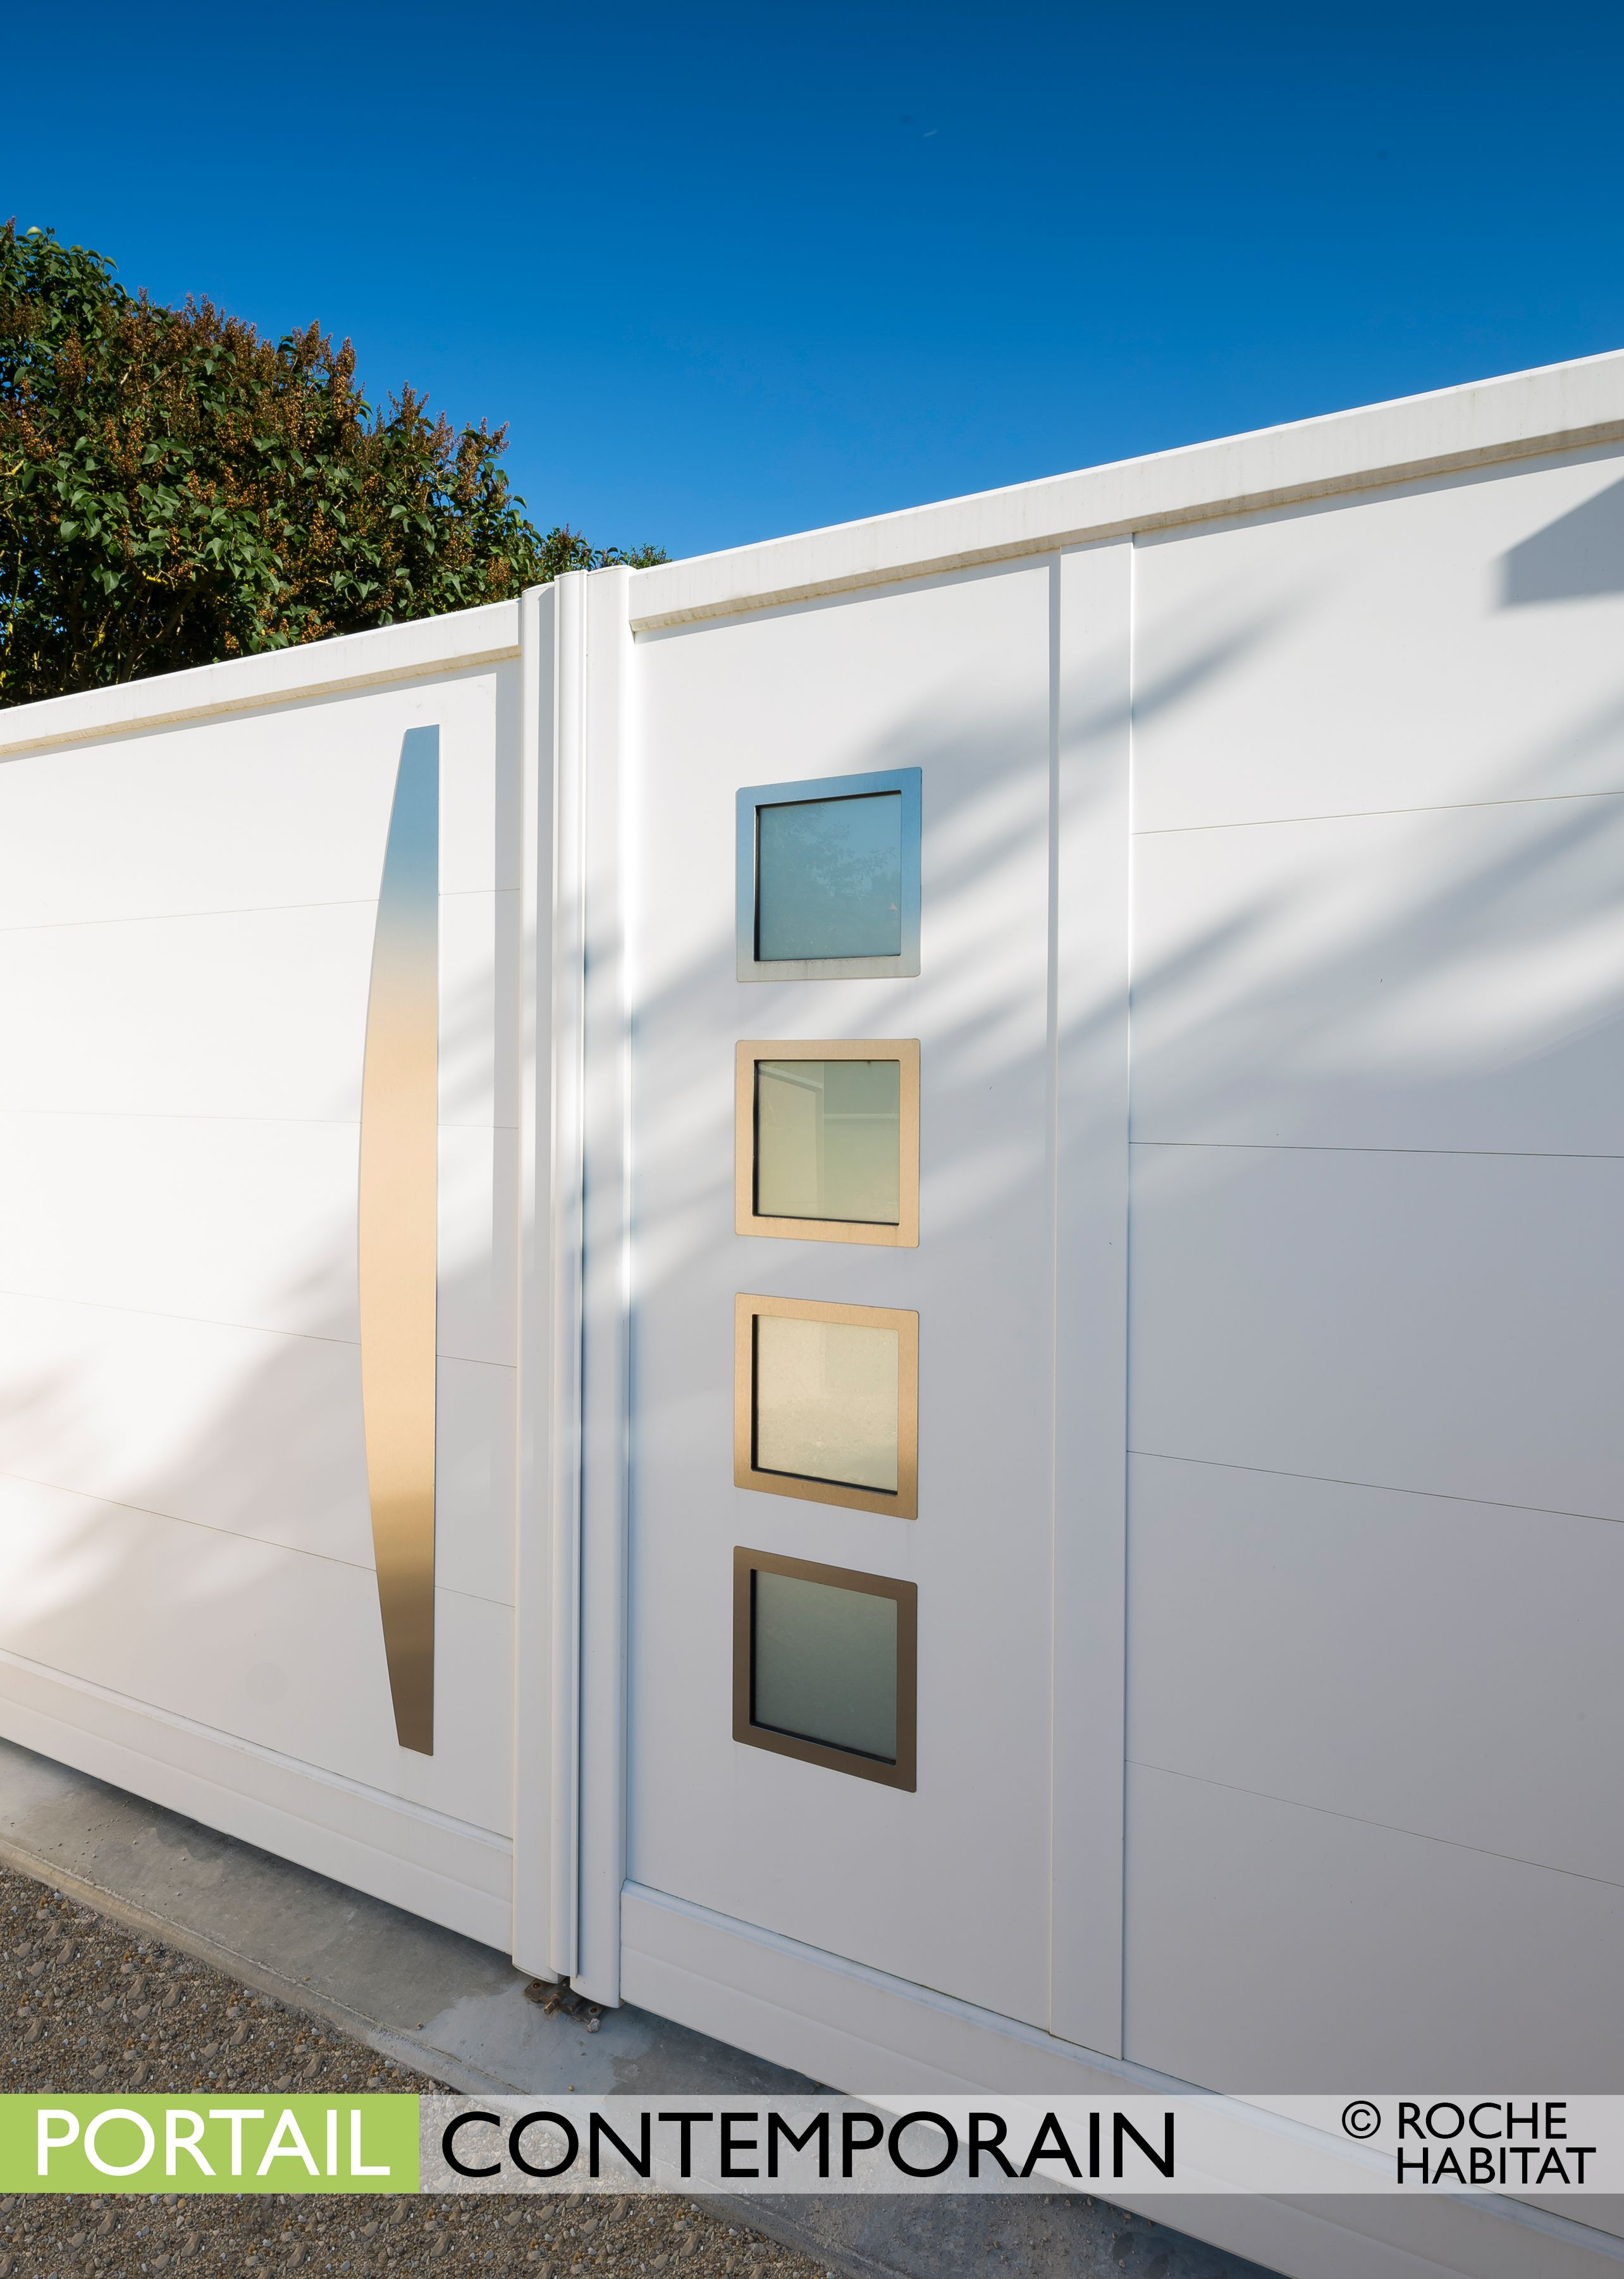 portail contemporain by roche habitat le portail new york. Black Bedroom Furniture Sets. Home Design Ideas